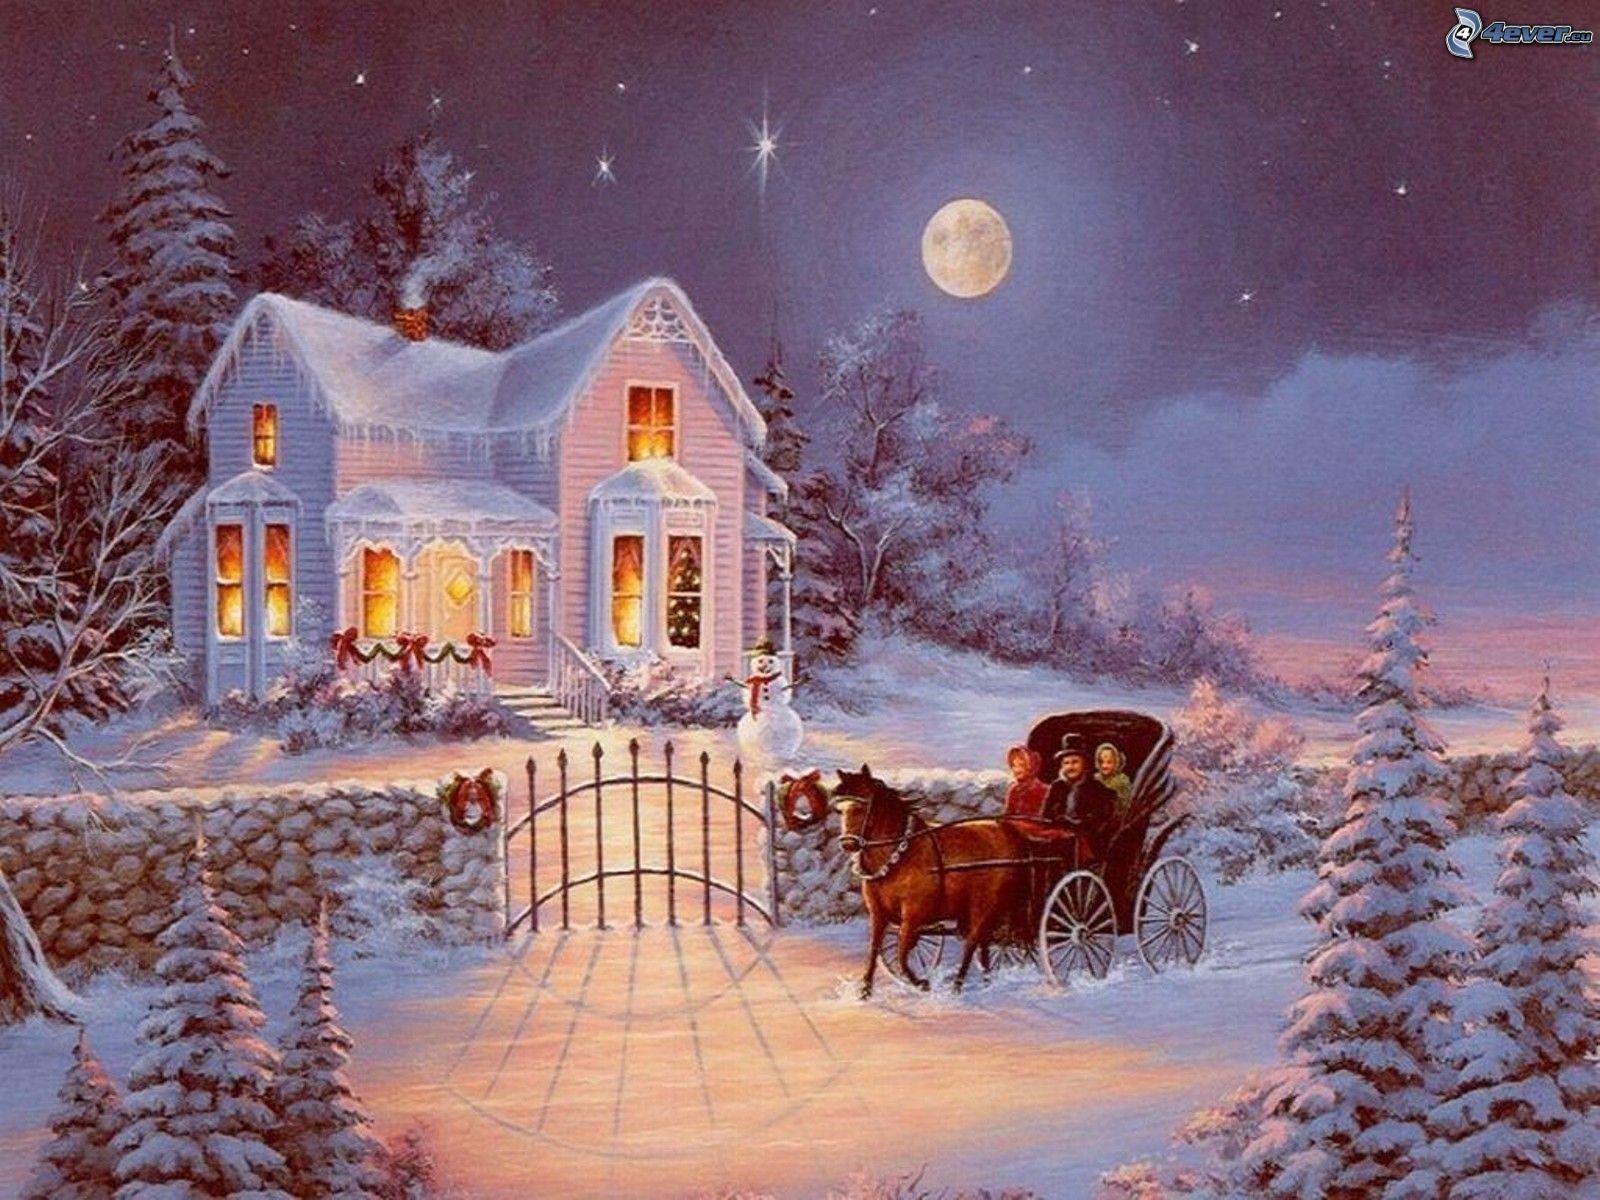 snowy house. Black Bedroom Furniture Sets. Home Design Ideas